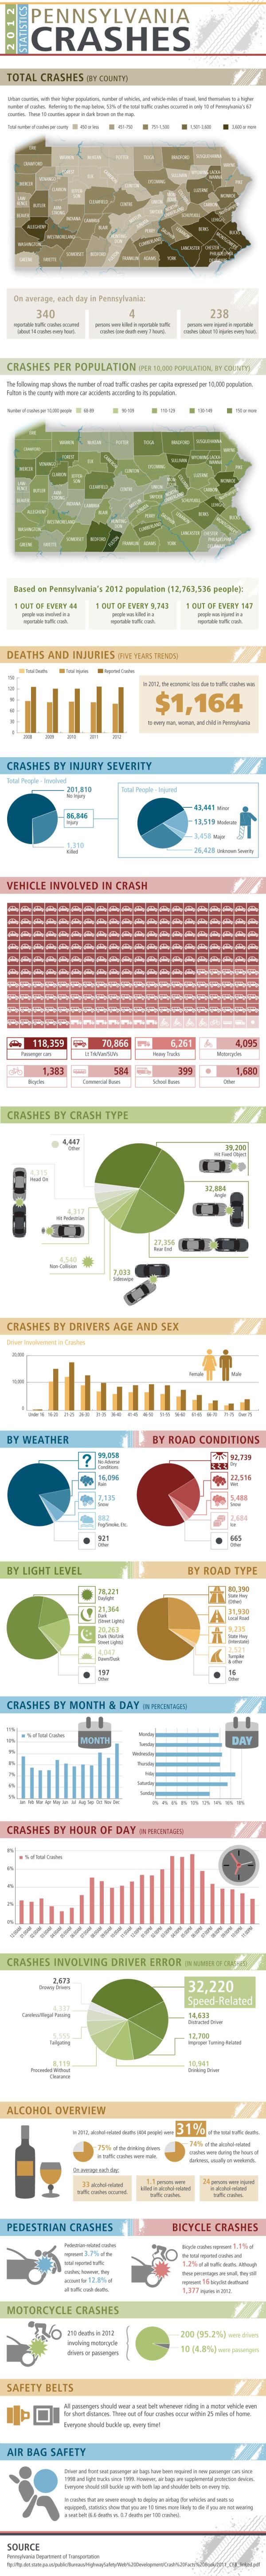 2012 Statistics: Pennsylvania Crashes infographic